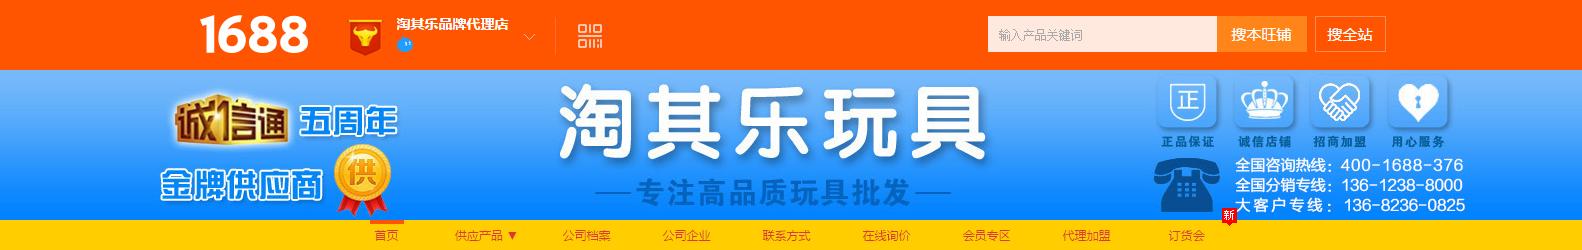 Магазин Taoqilewj